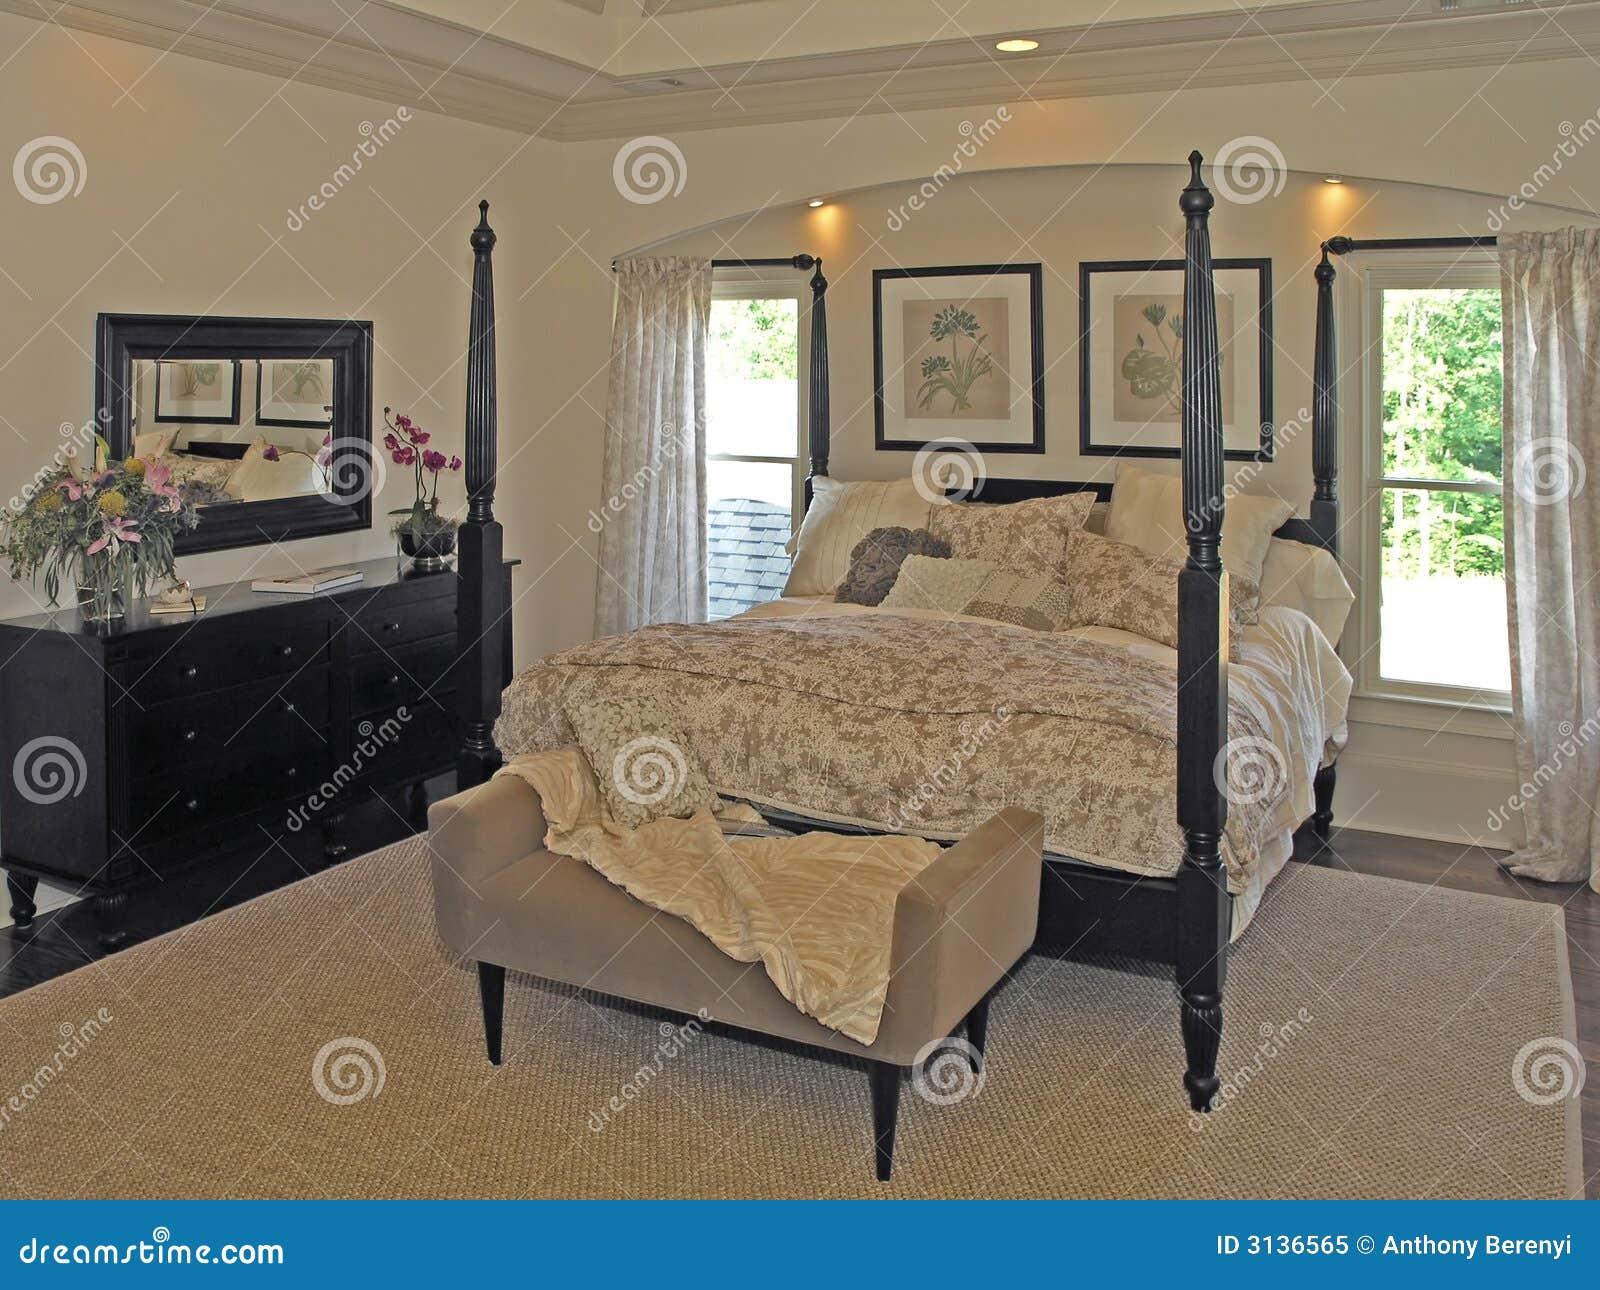 Luxury 7 - bed room 3